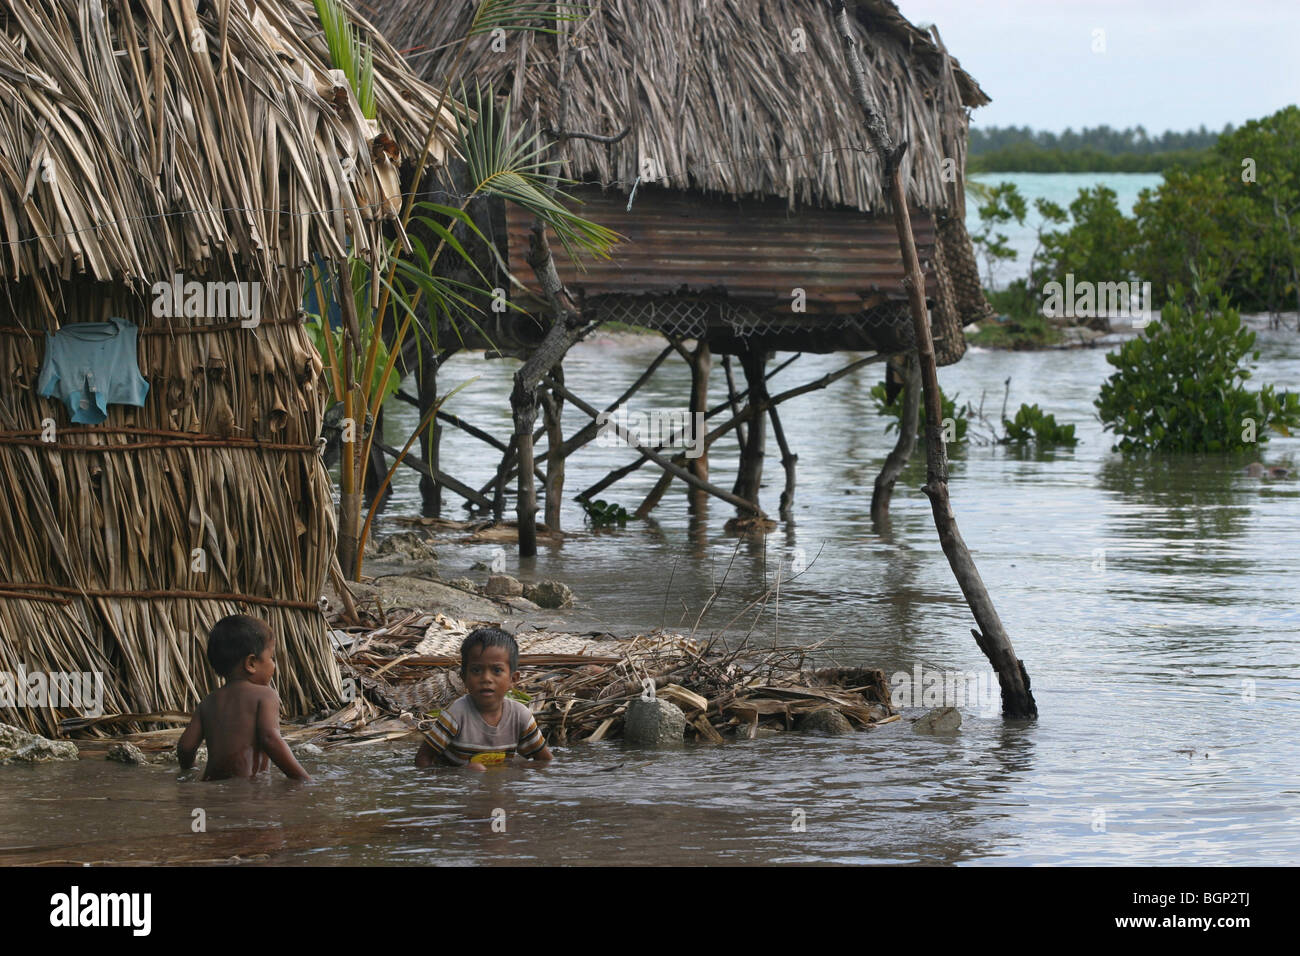 The islands of Kiribati atoll in the Pacific Ocean. - Stock Image